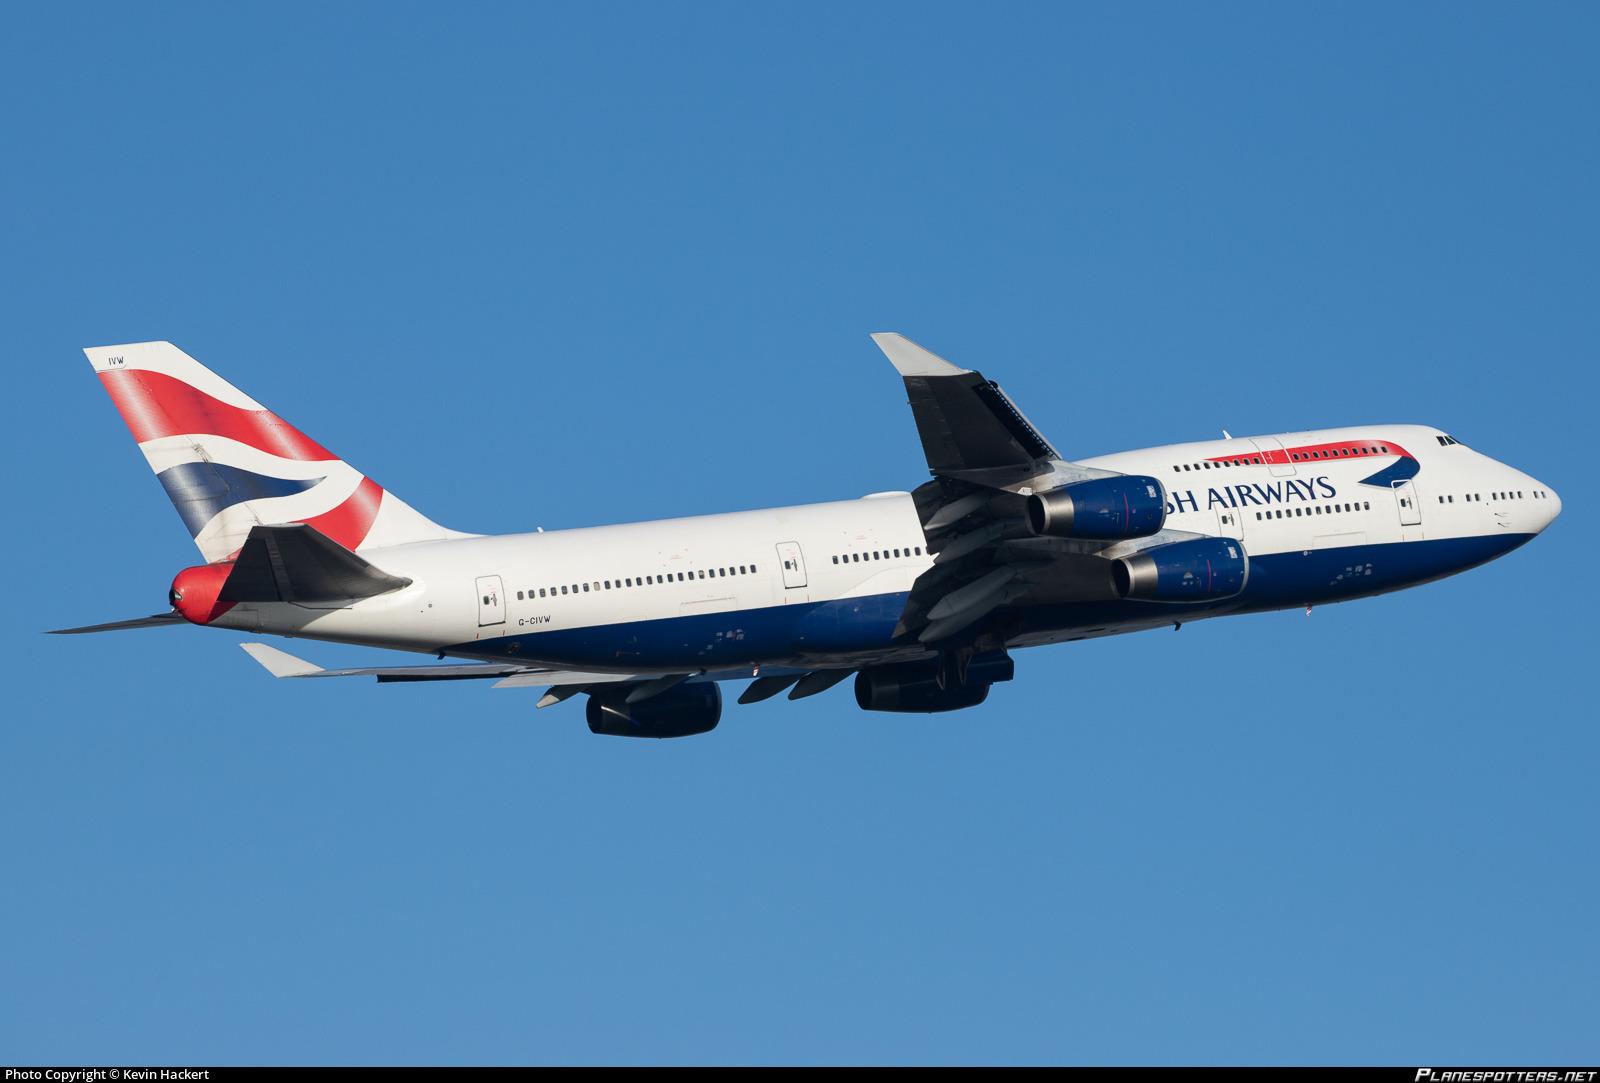 G-CIVW British Airways Boeing 747-436 Photo by Kevin Hackert | ID 1033958 | Planespotters.net